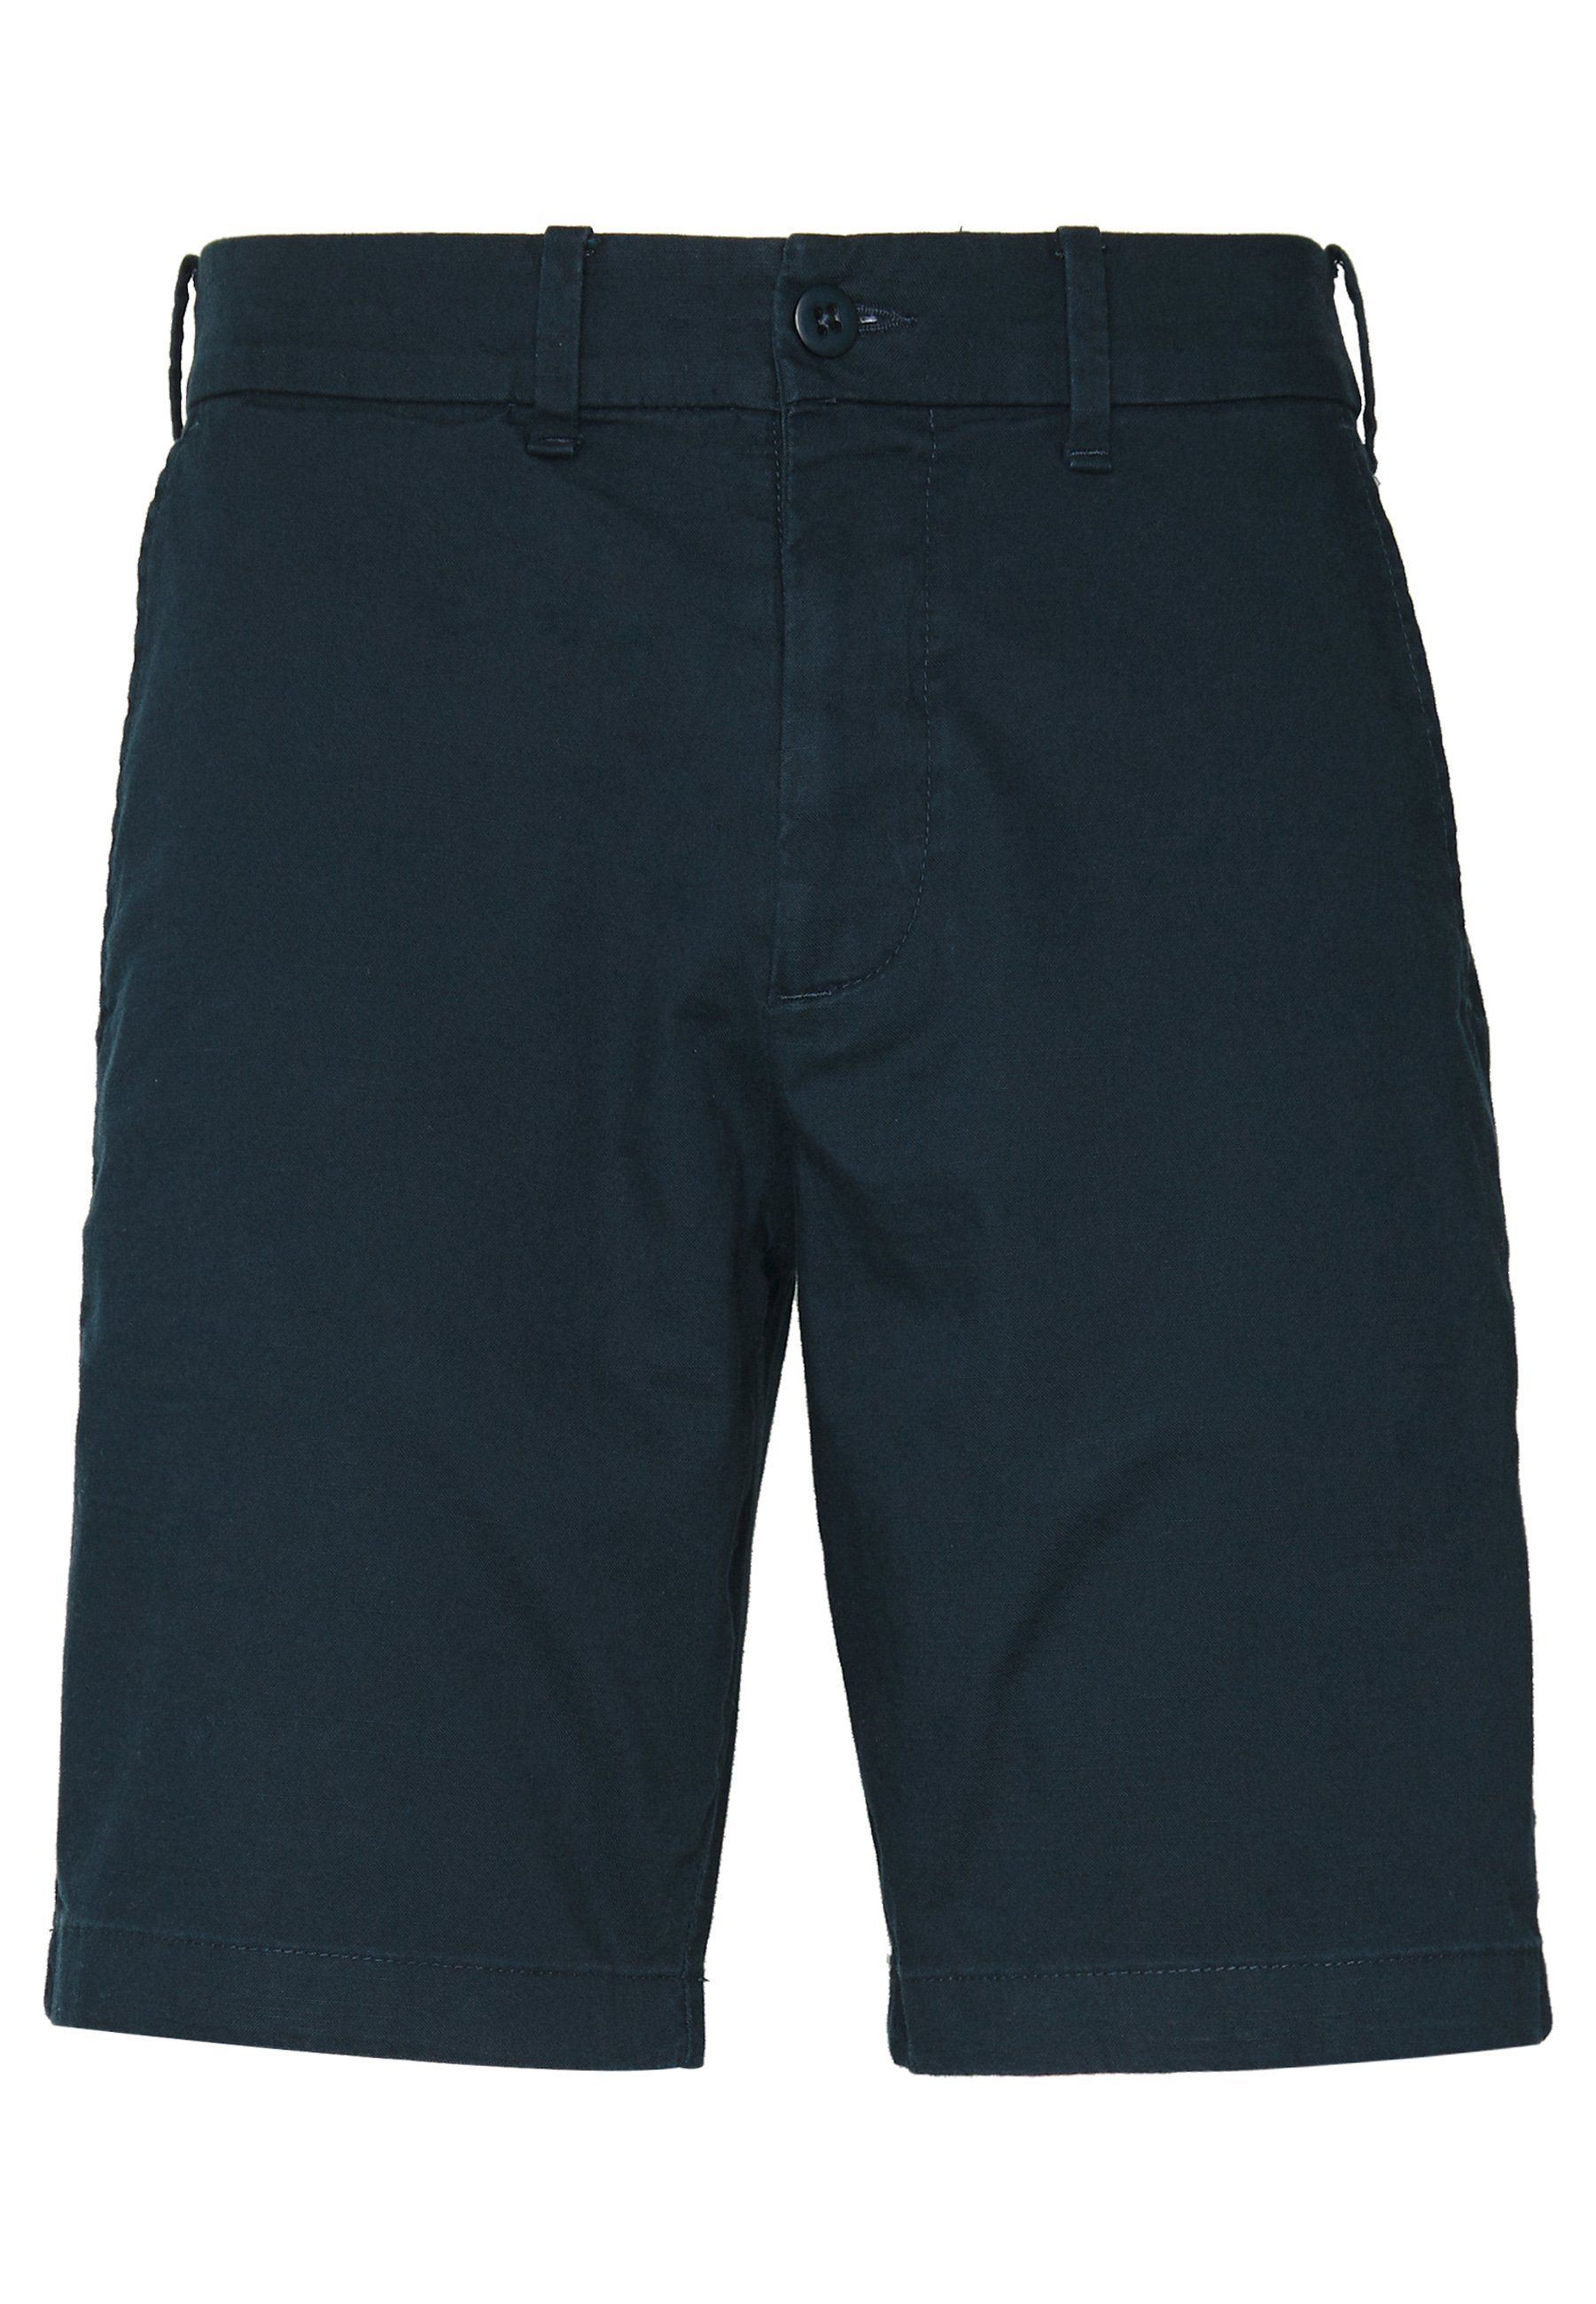 Abercrombie & Fitch Shortsit - Navy